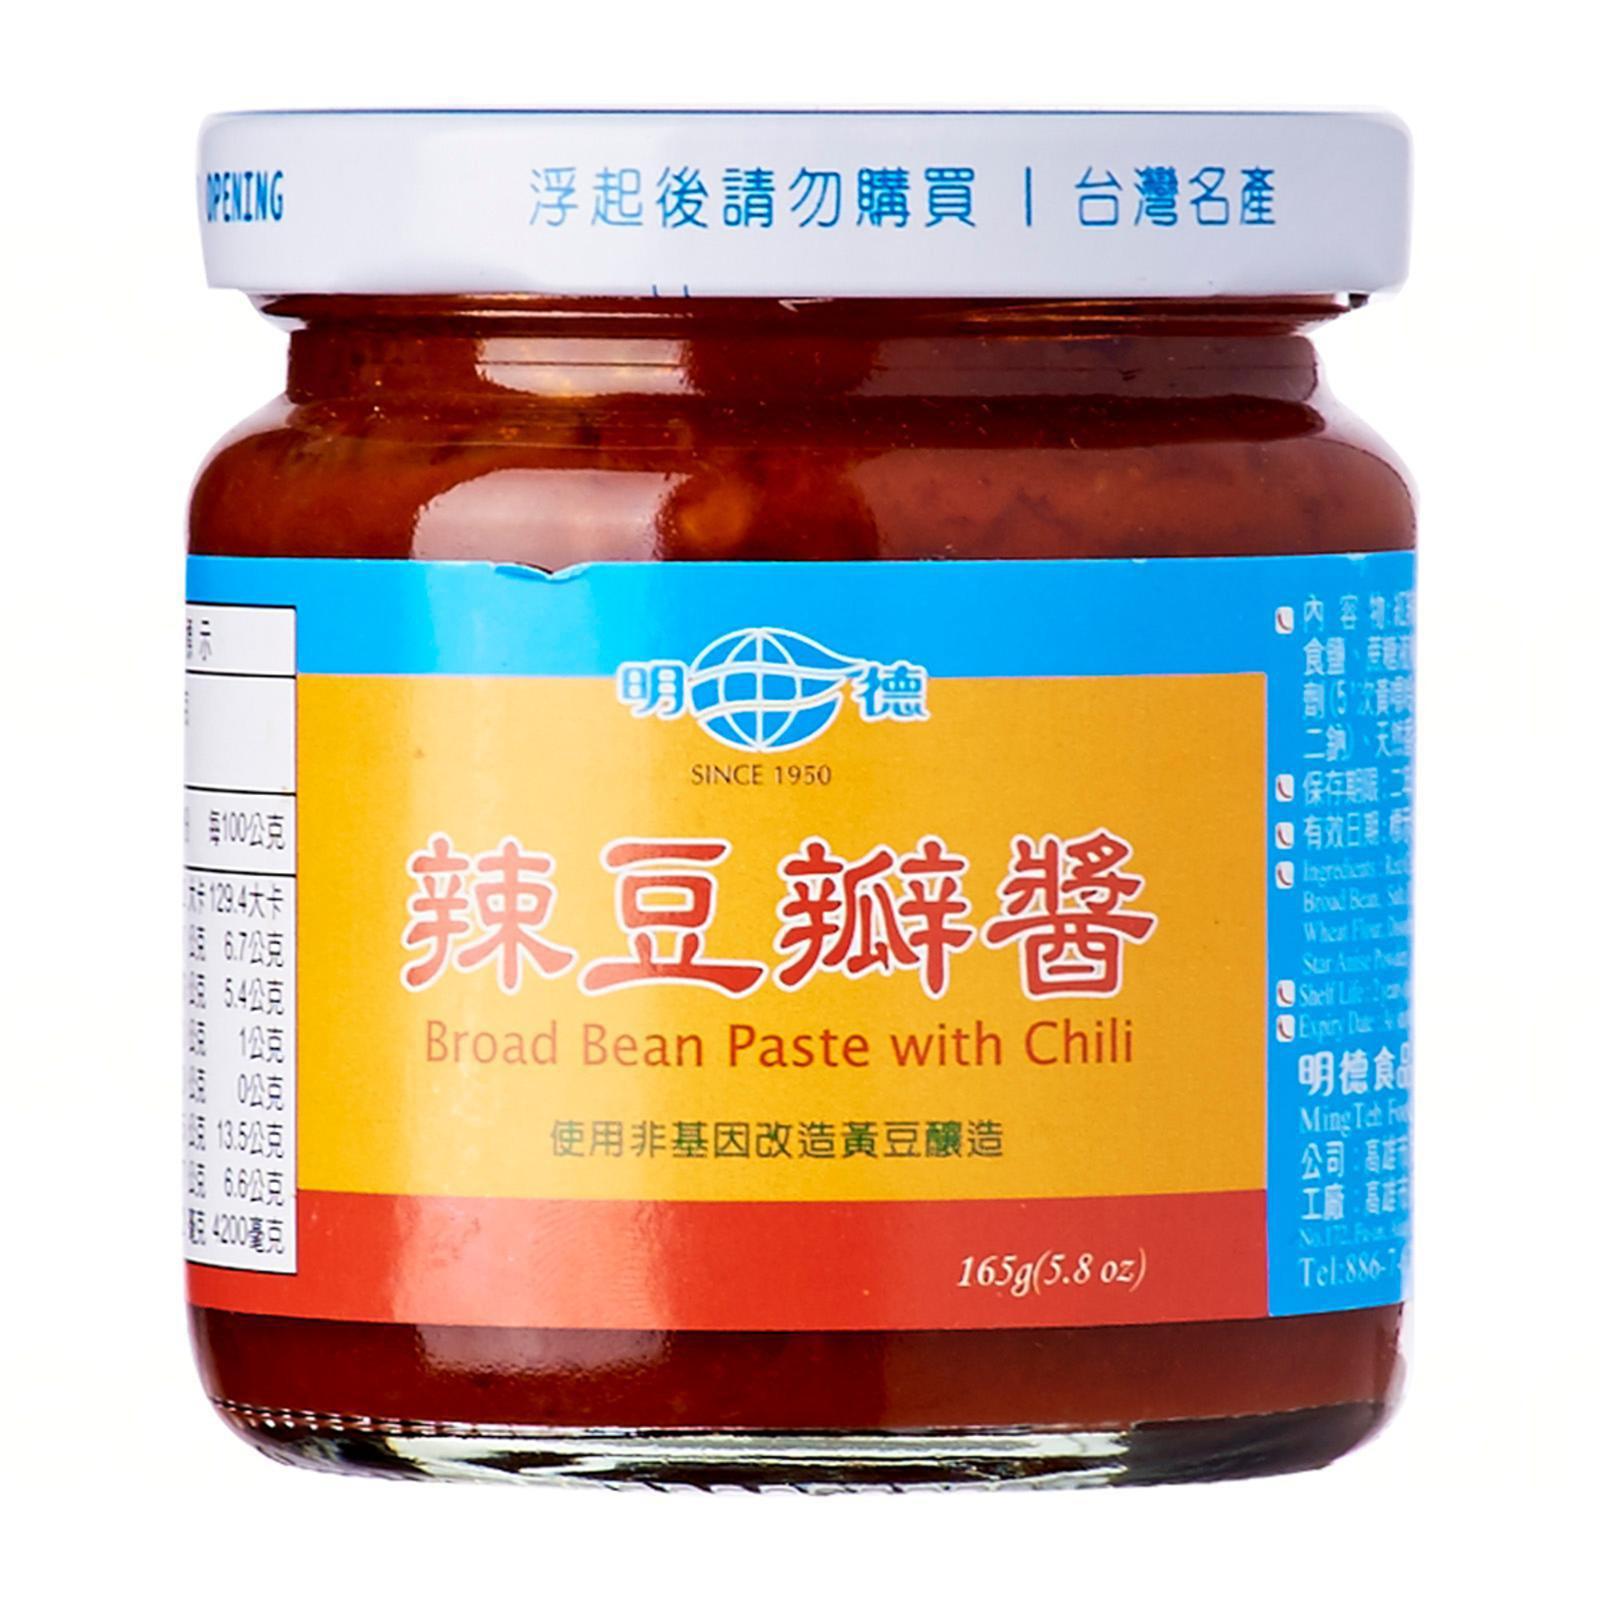 Ming Teh Broad Bean Paste - Chilli